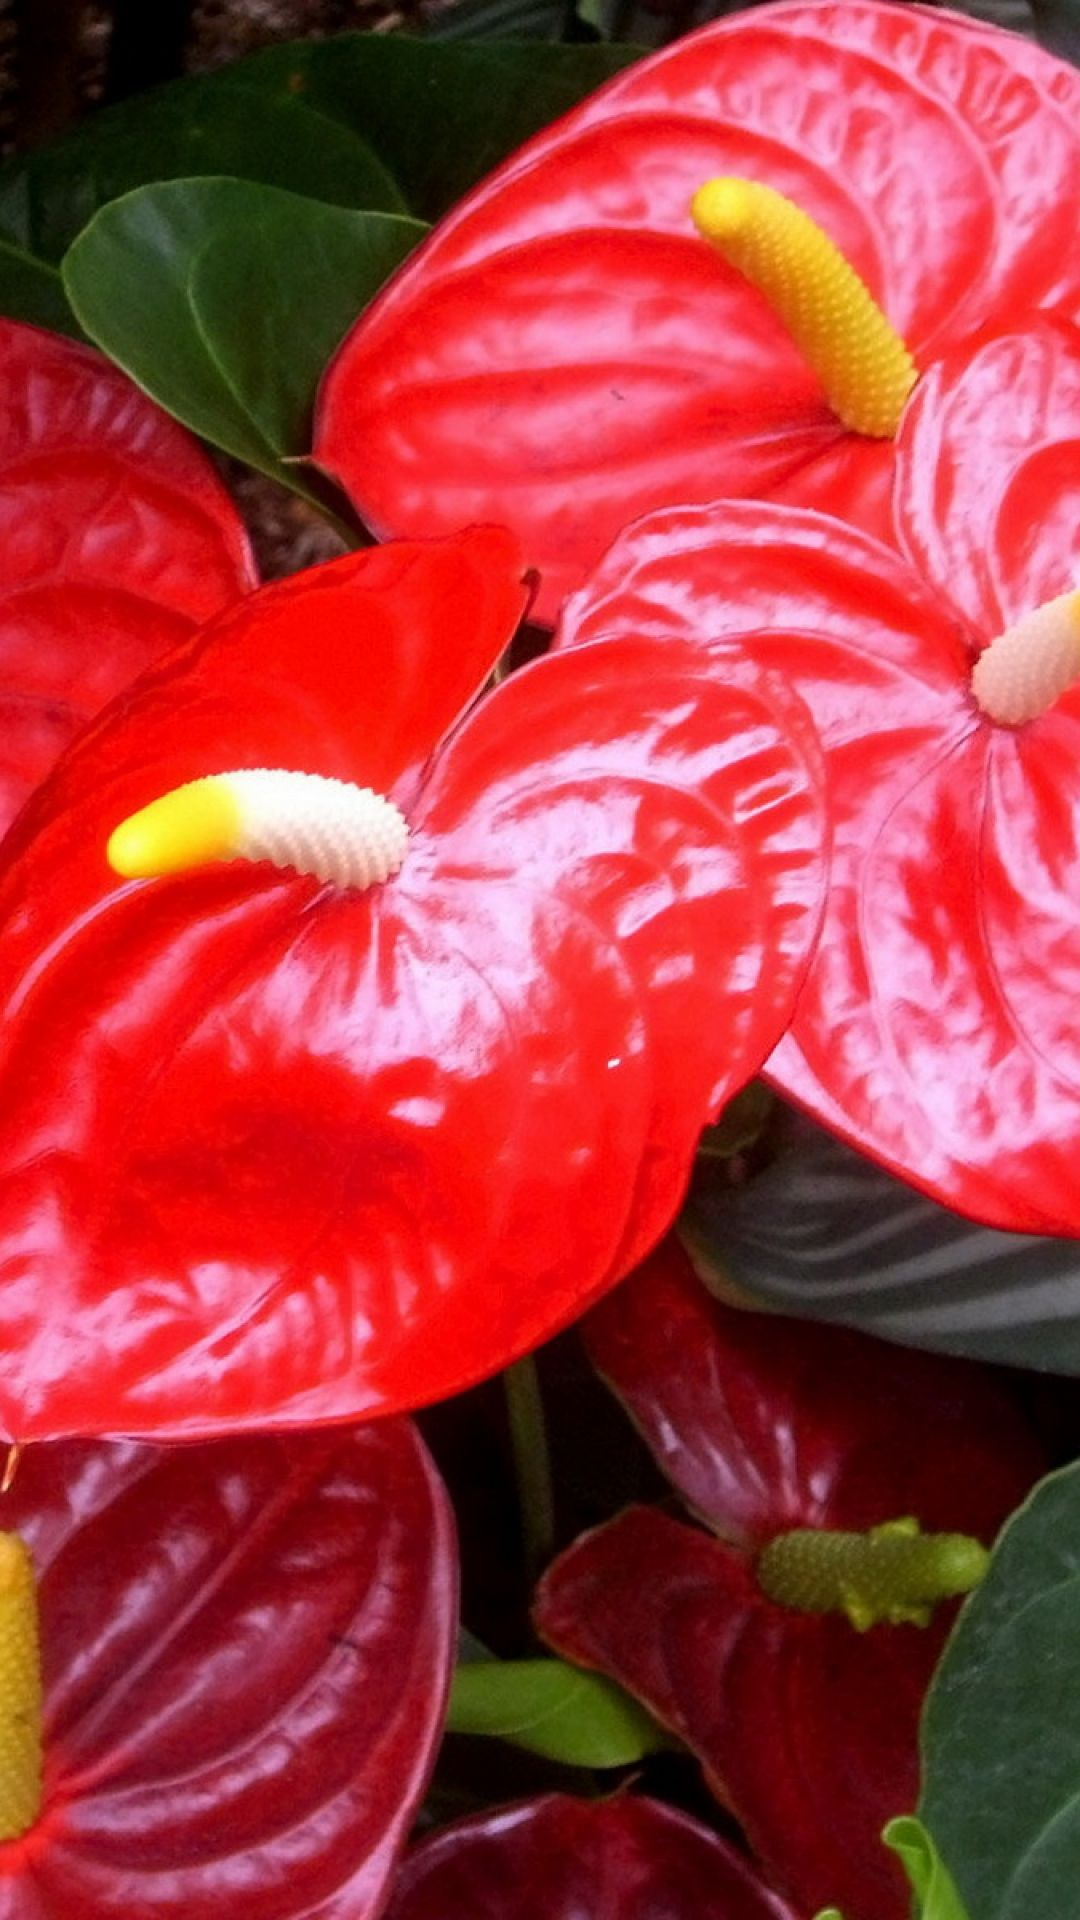 Download Wallpaper 1080x1920 Anthurium Flower Red Green Close Up Sony Xperia Z1 Zl Z Samsung Galaxy S4 Htc One Hd Back Jardineria Plantas Jardin Flores